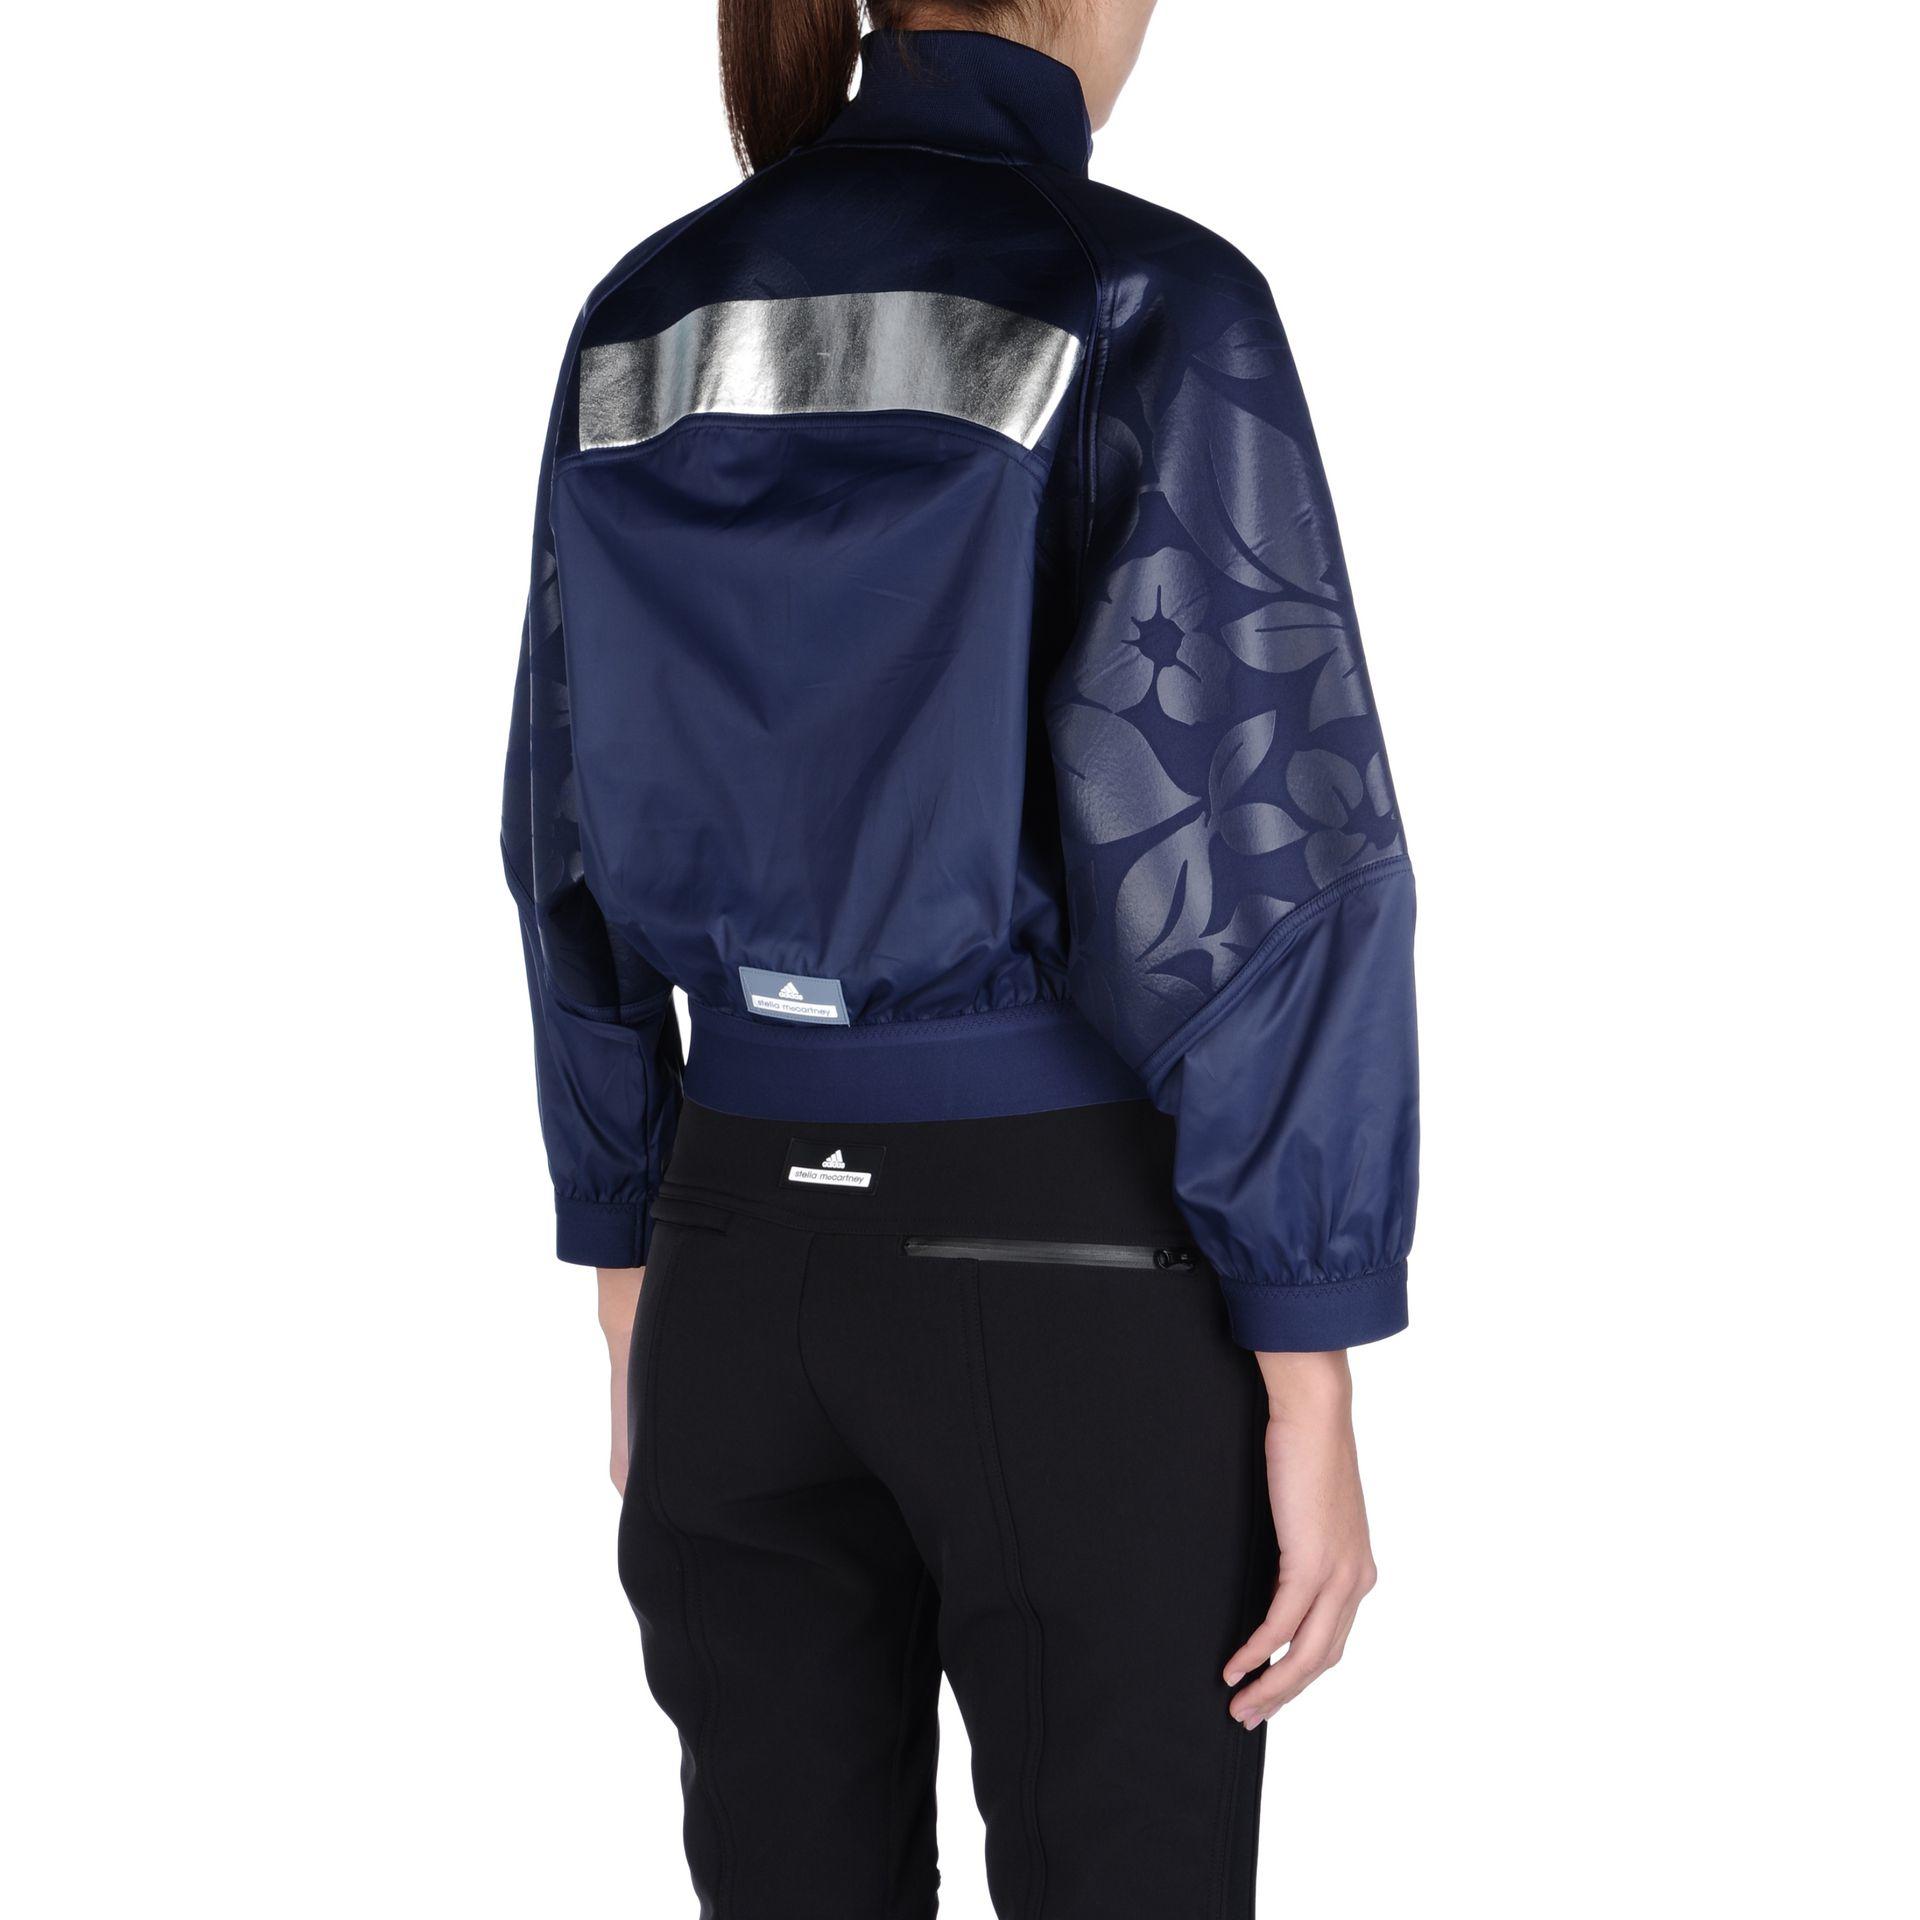 0ec430b2b59 adidas-by-stella-mccartney-navy-navy-run-sweatshirt -blue-product-3-335554770-normal.jpeg